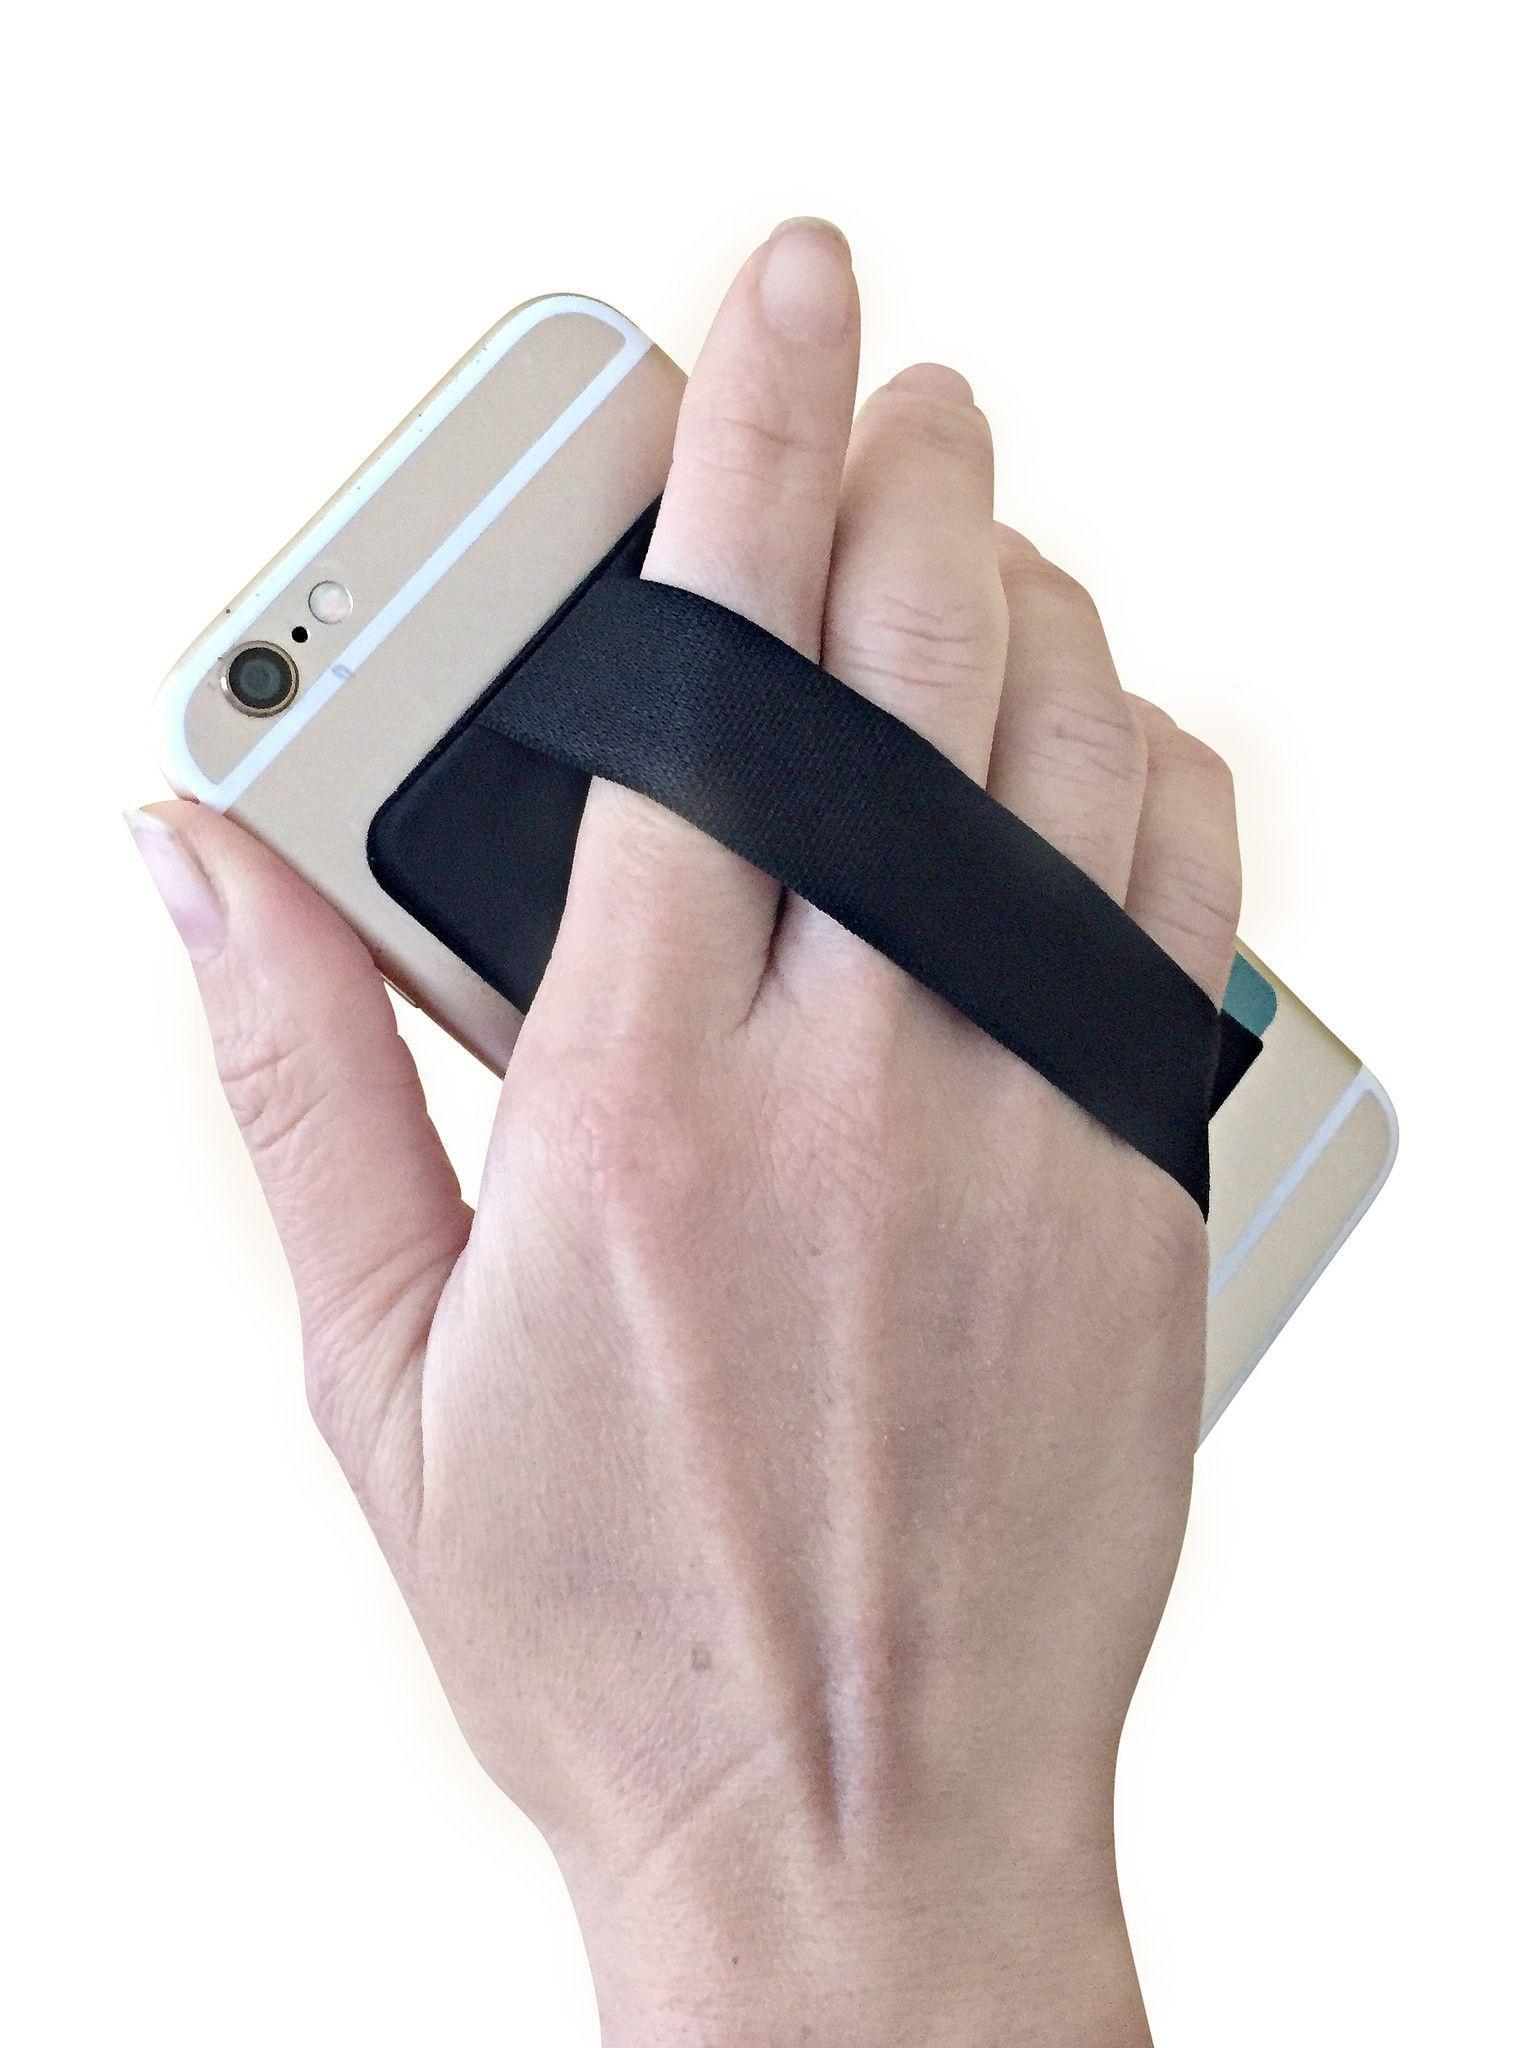 Cyanics adhesive stick on card holder pocket hand strap